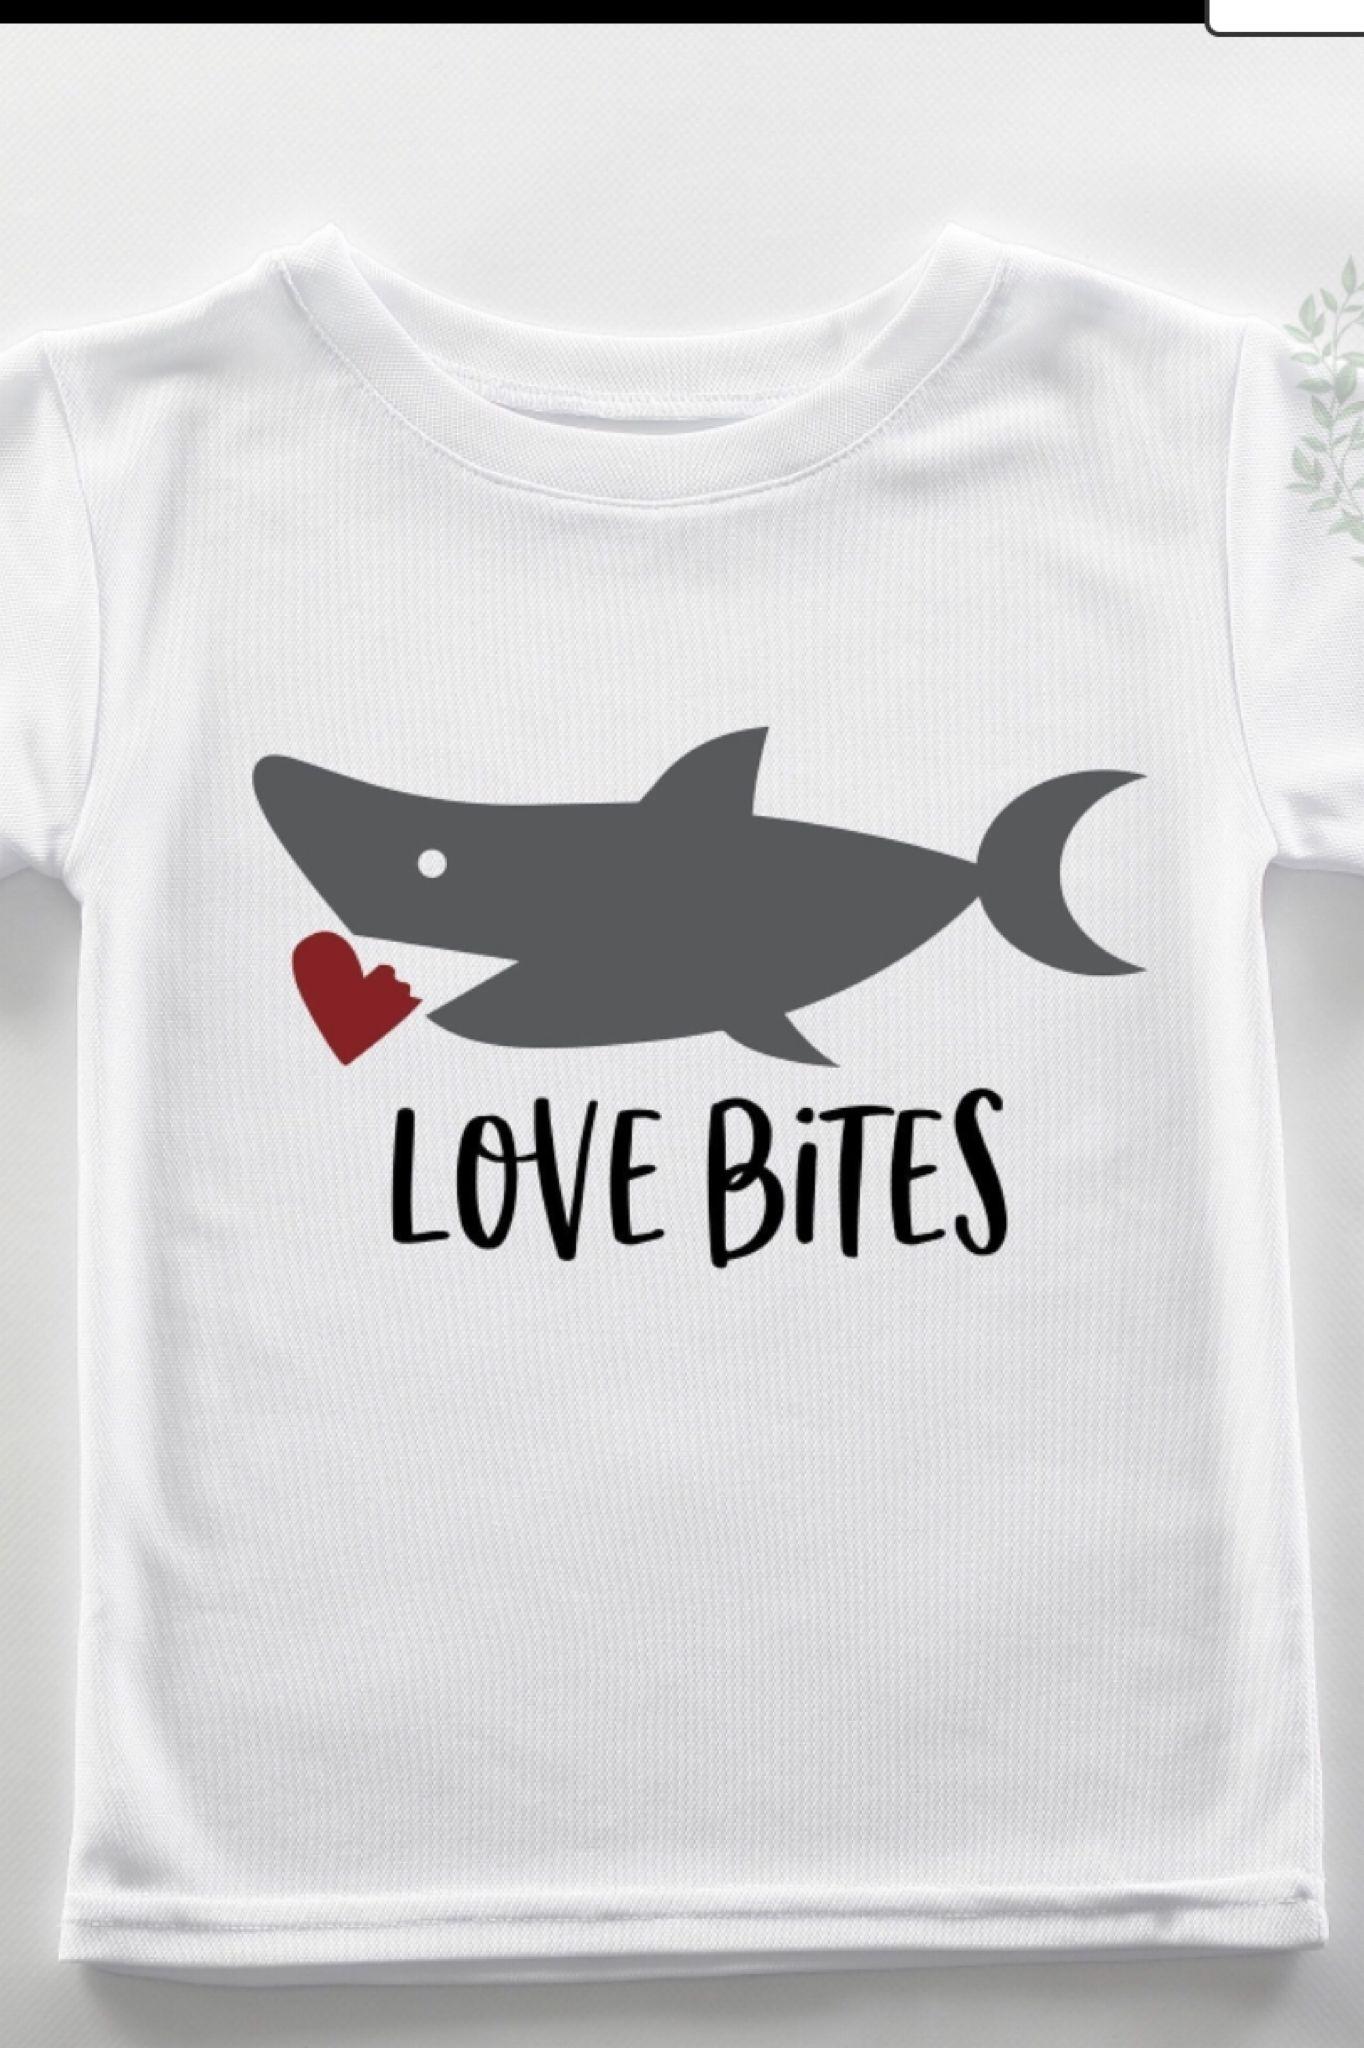 Download Love Bites Svg, Valentines Day Svg, Valentine Sark Svg ...